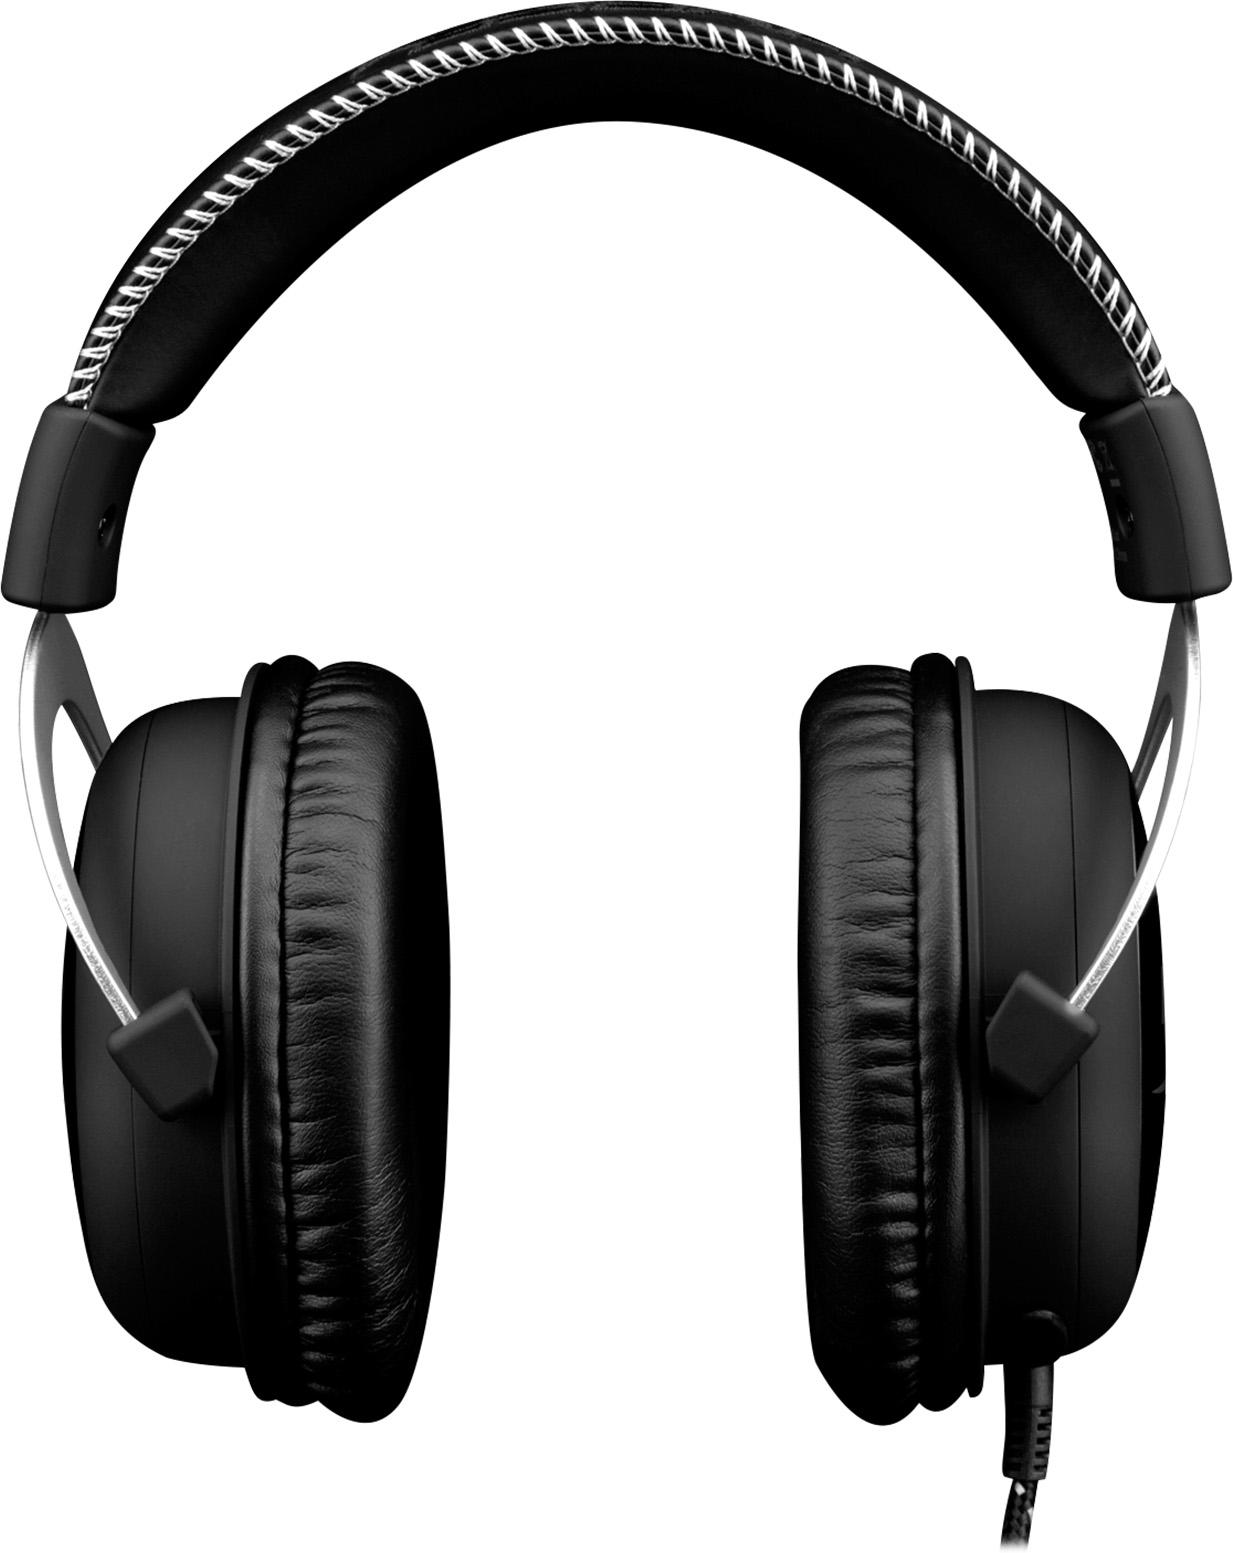 HyperX CloudX Pro Gaming Headset